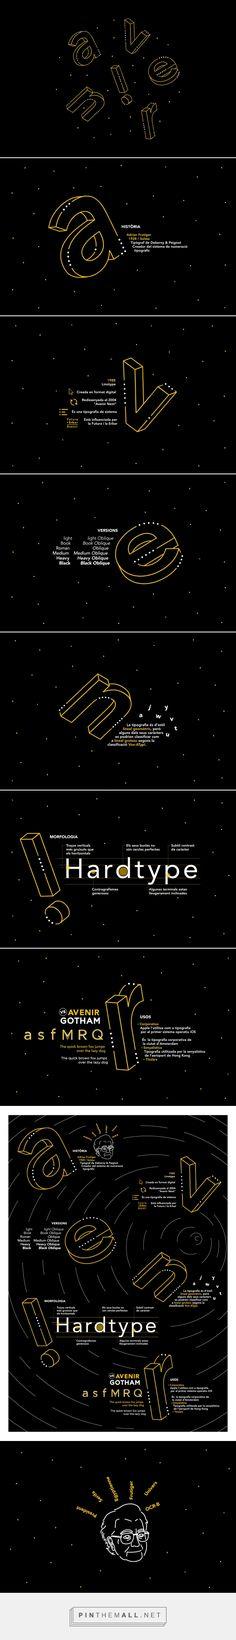 Avenir infographic on Behance - created via https://pinthemall.net #3dprintinginfographic